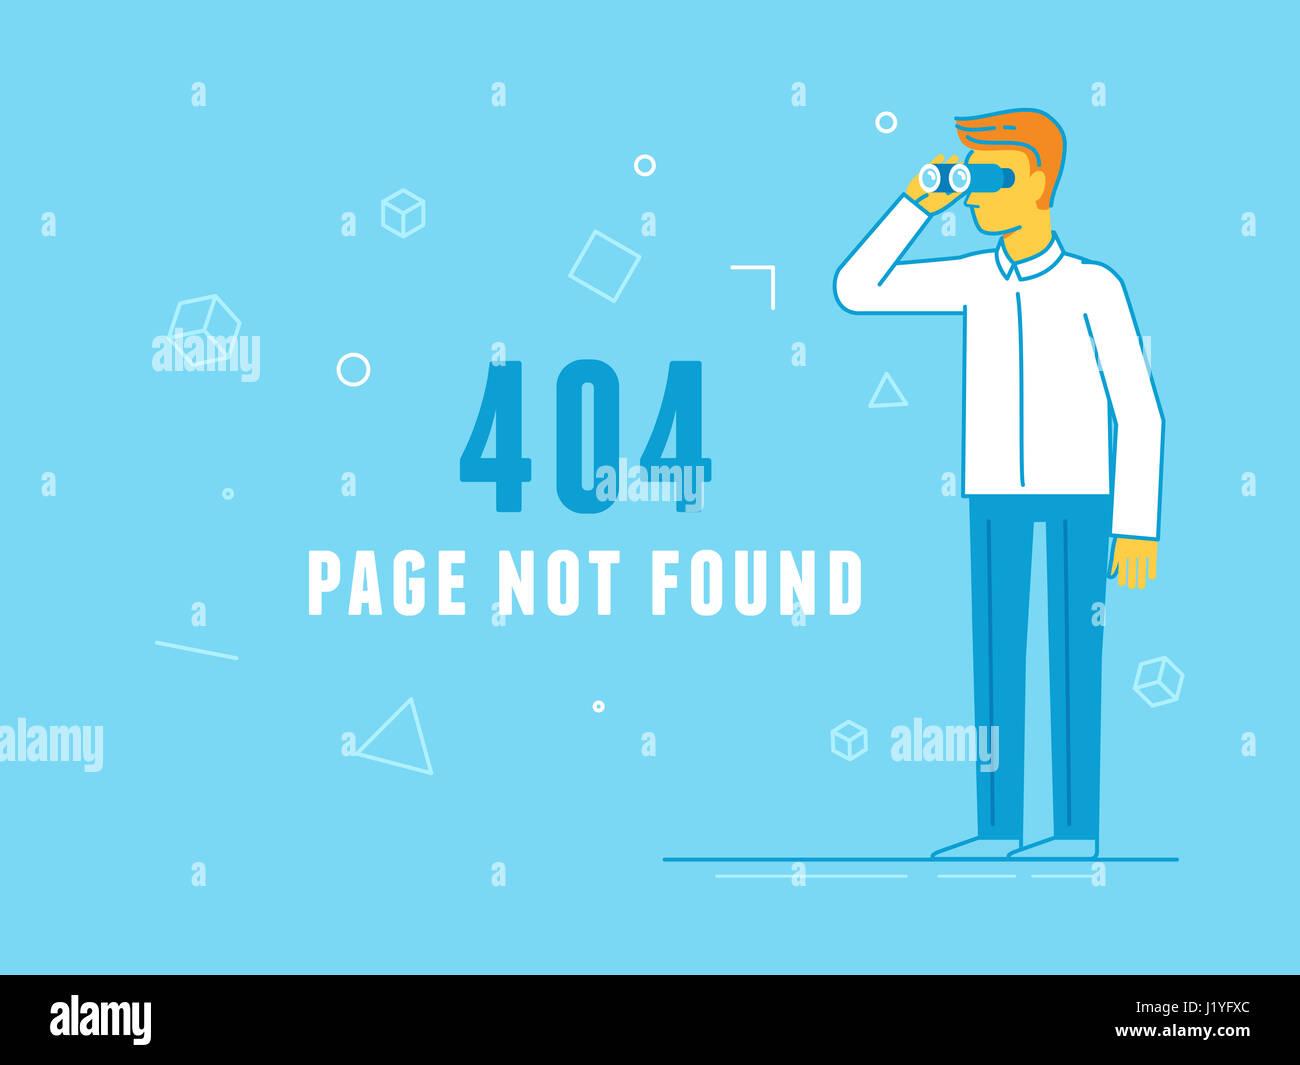 404 Error Page Template Illustration Stockfotos & 404 Error Page ...